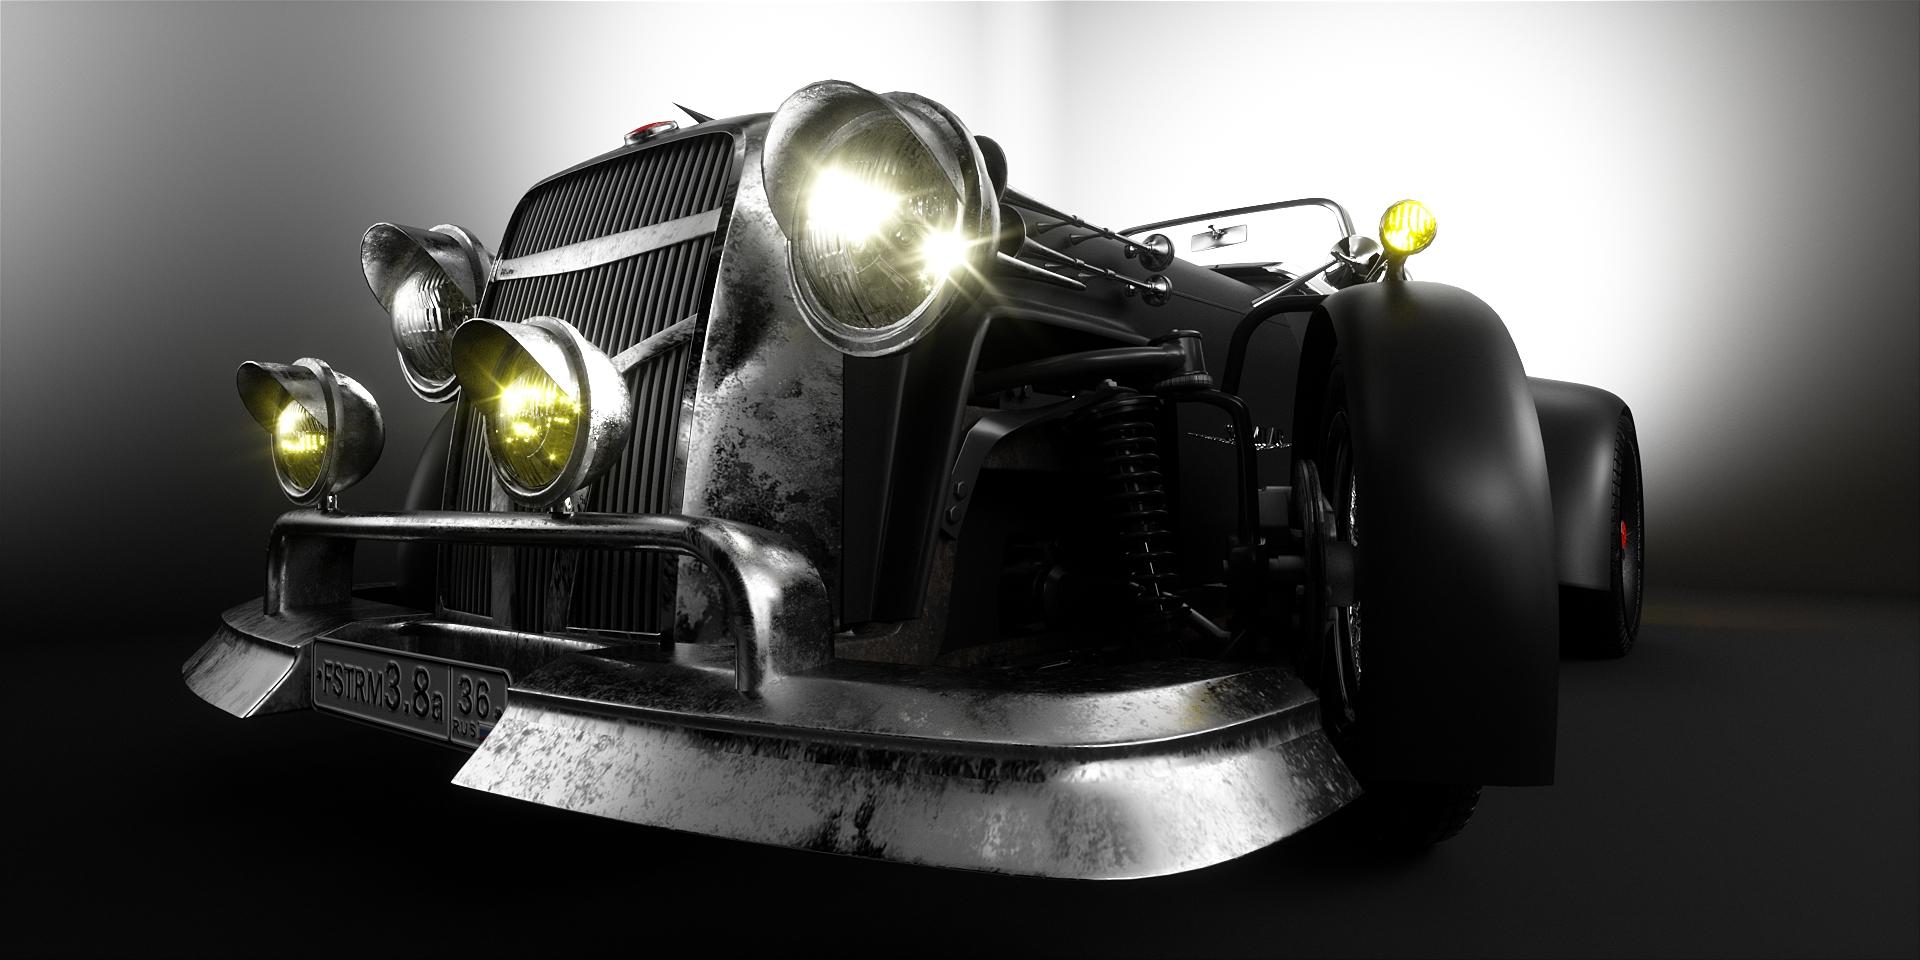 Cygnus Scimitar 1950 Roadster